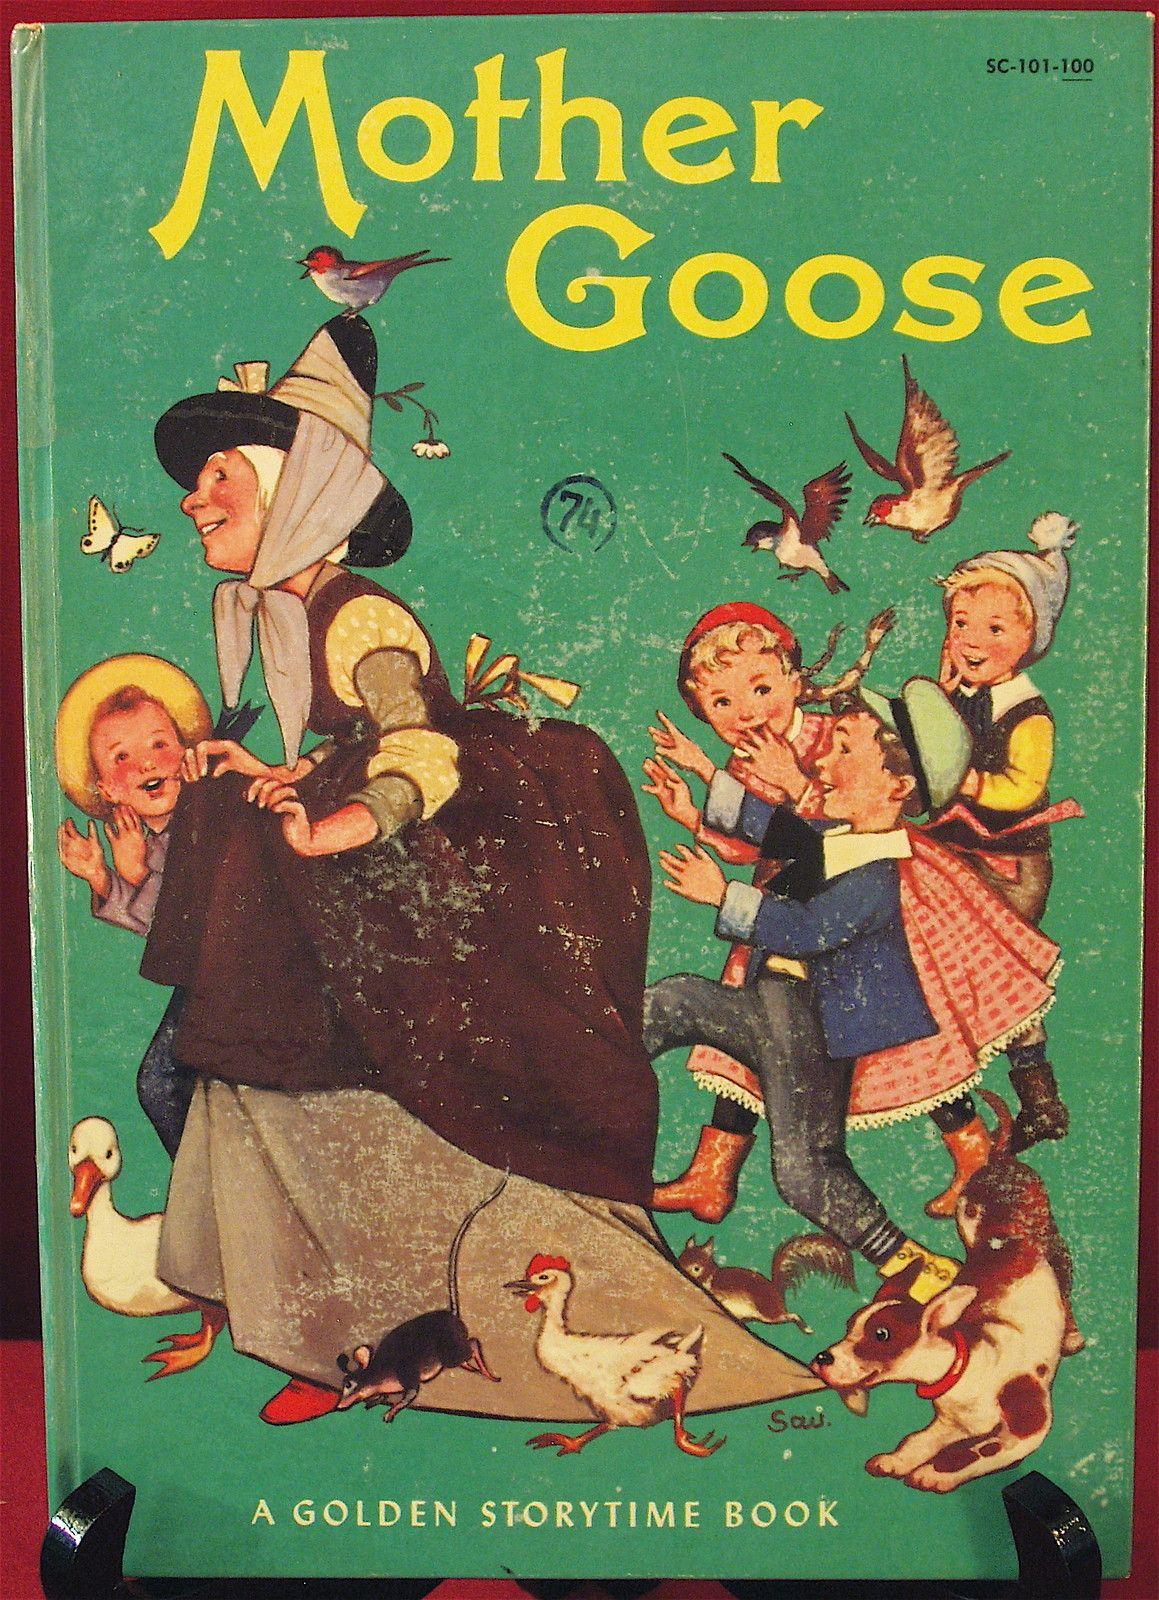 ''Mother GOOSE'', Simon and Schuster 1957. Illustrated by Adriana Mazza Saviozzi | eBay